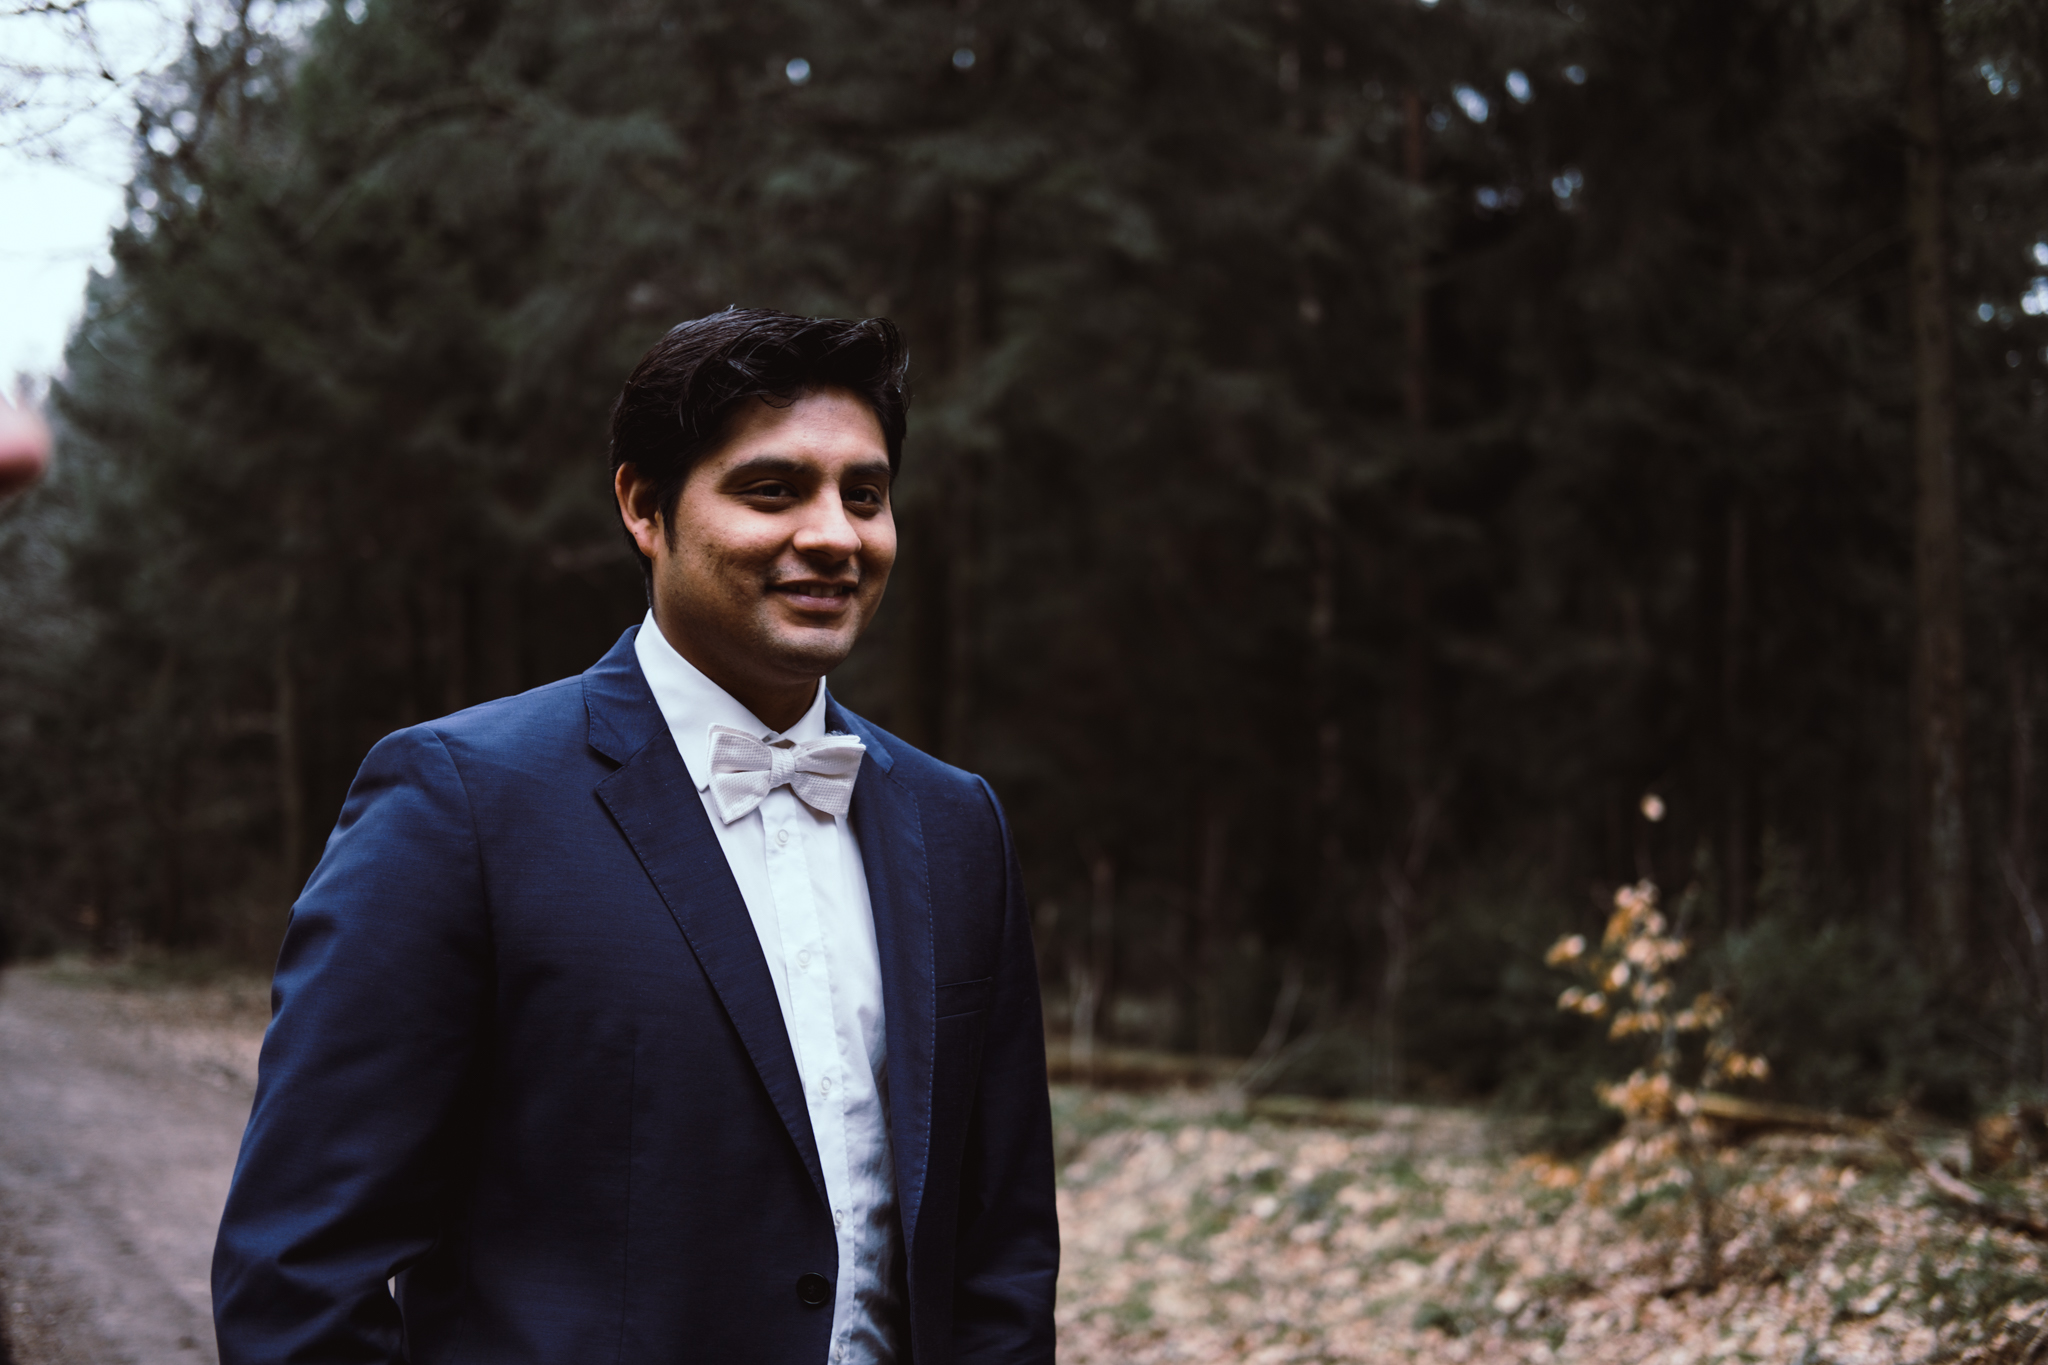 Bräutigam mit Gitarre im Wald